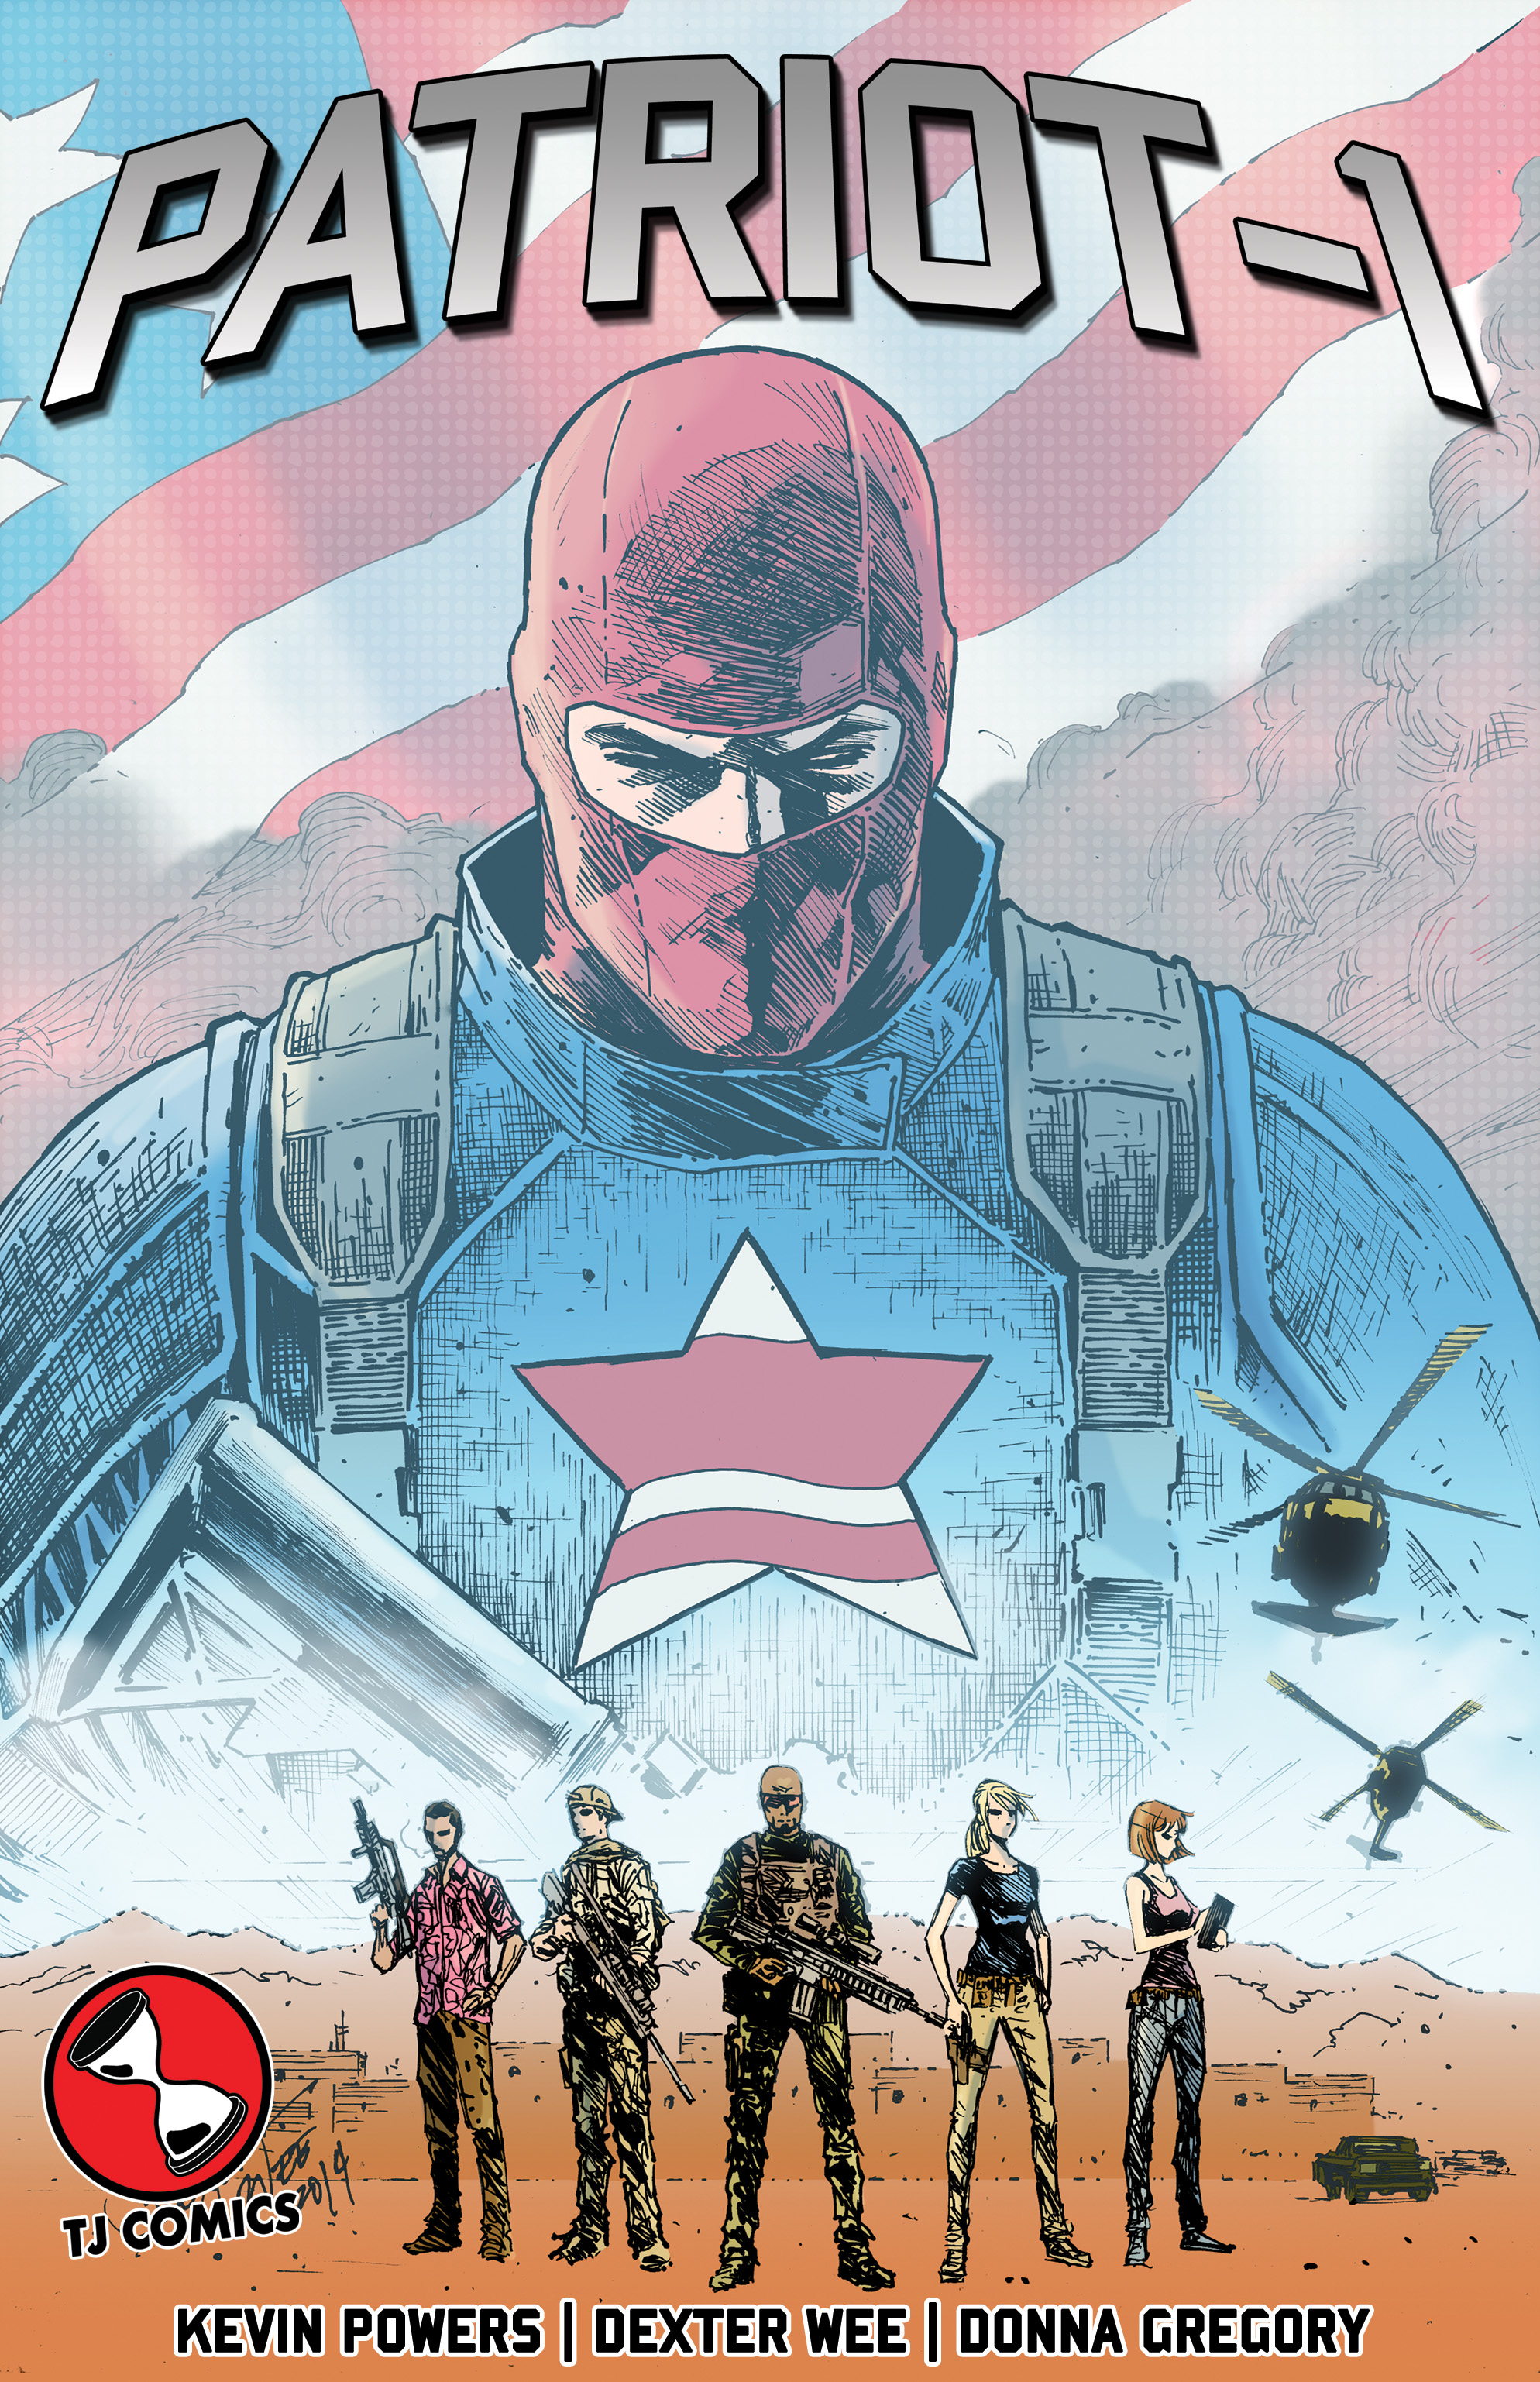 Patriot-1 Cover